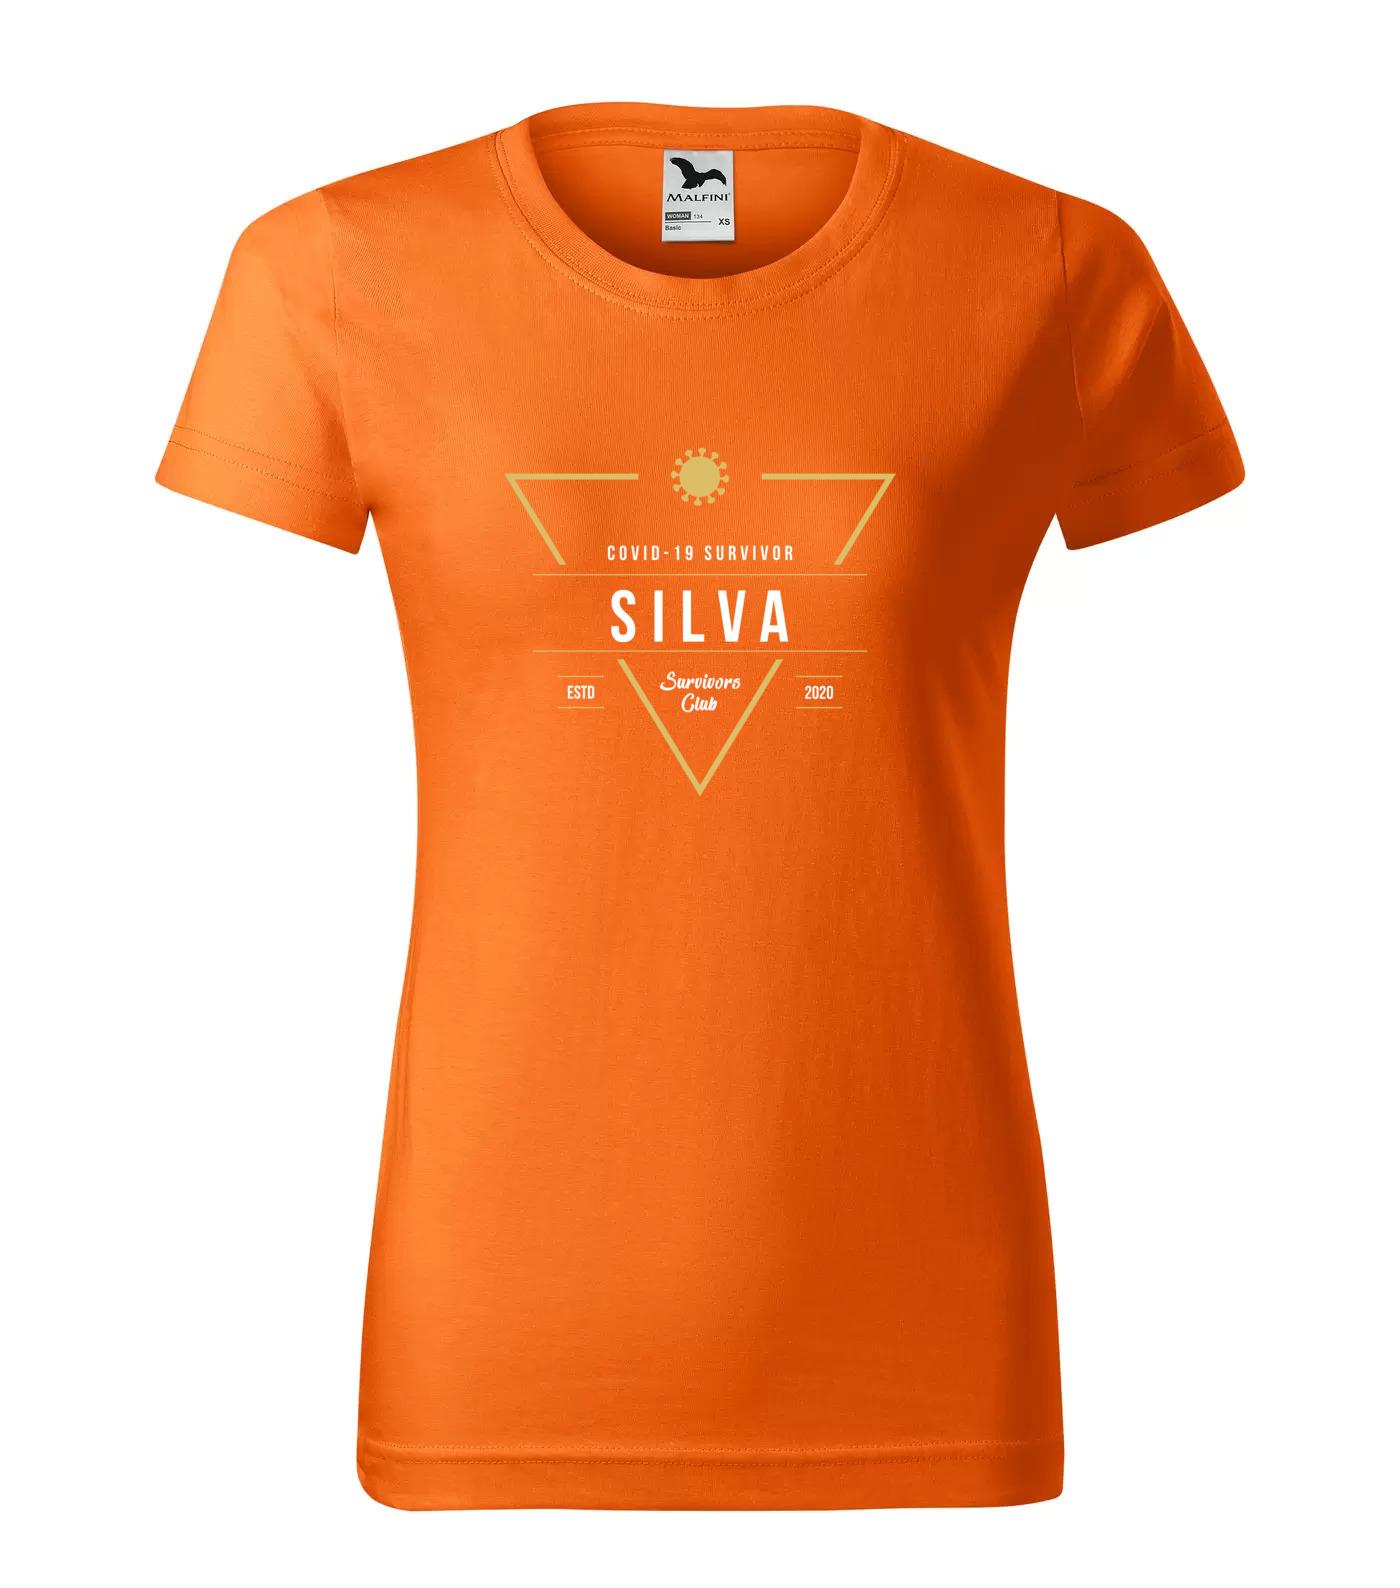 Tričko Survivor Club Silva